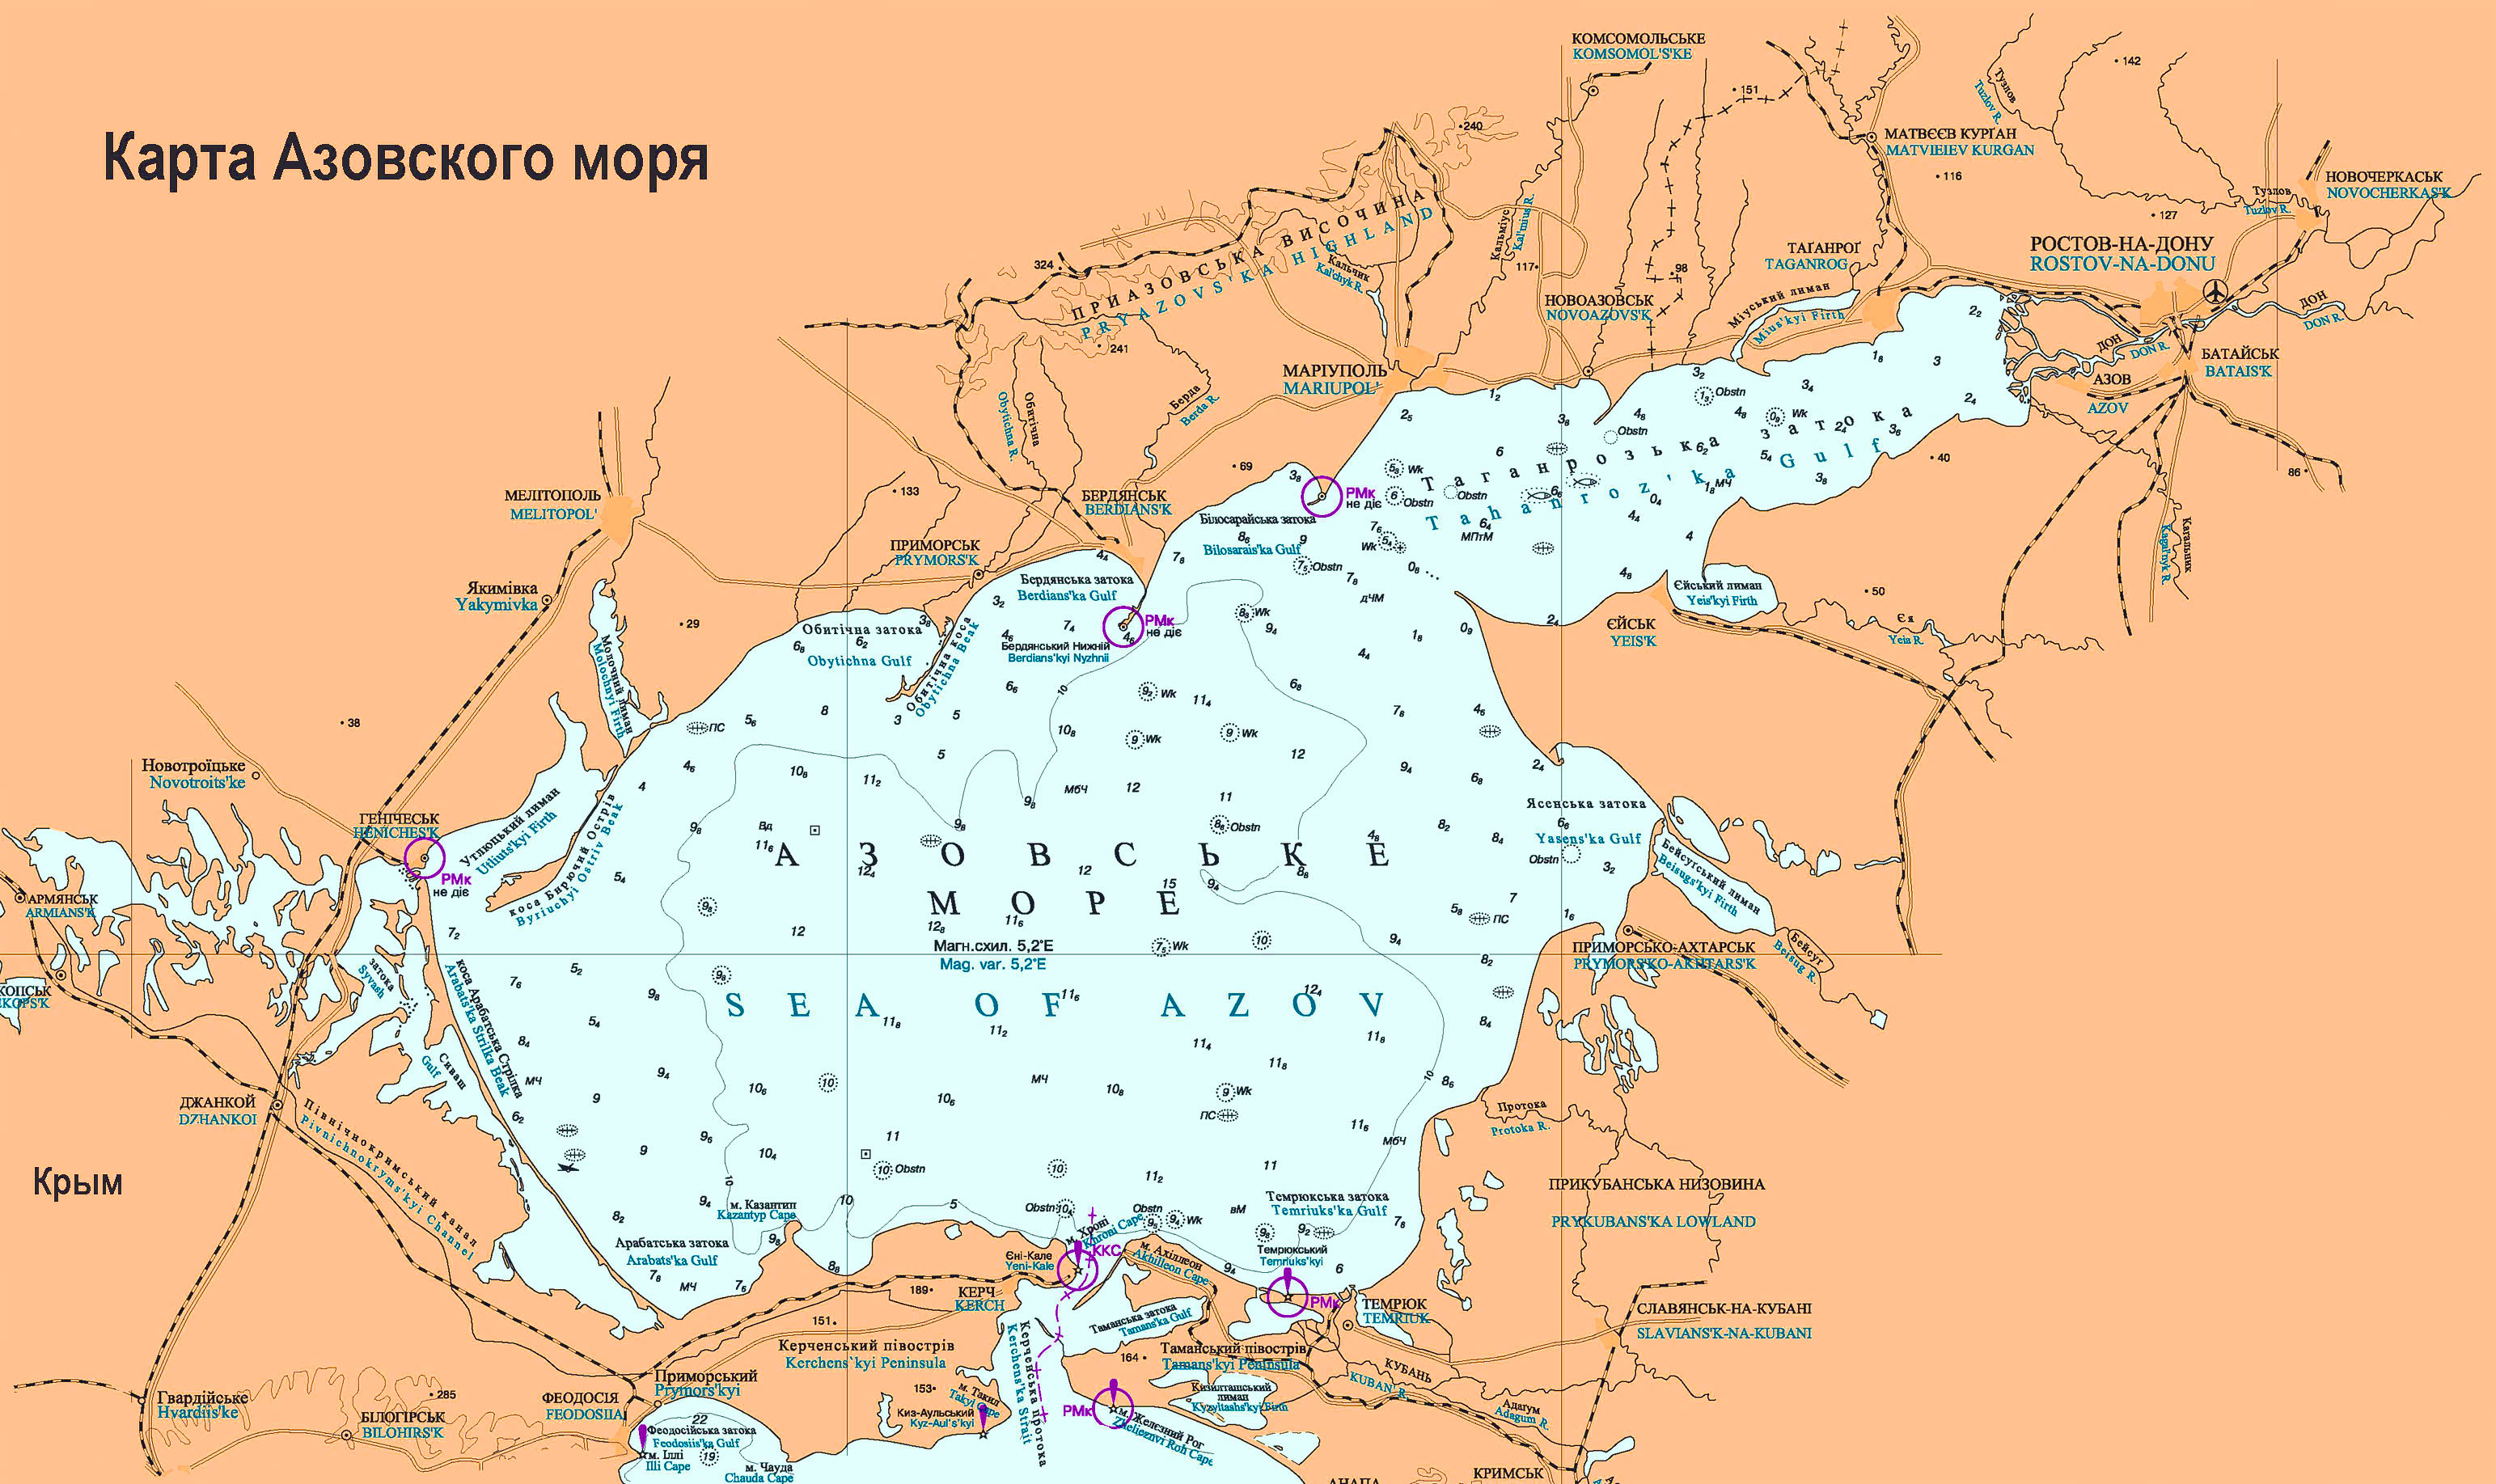 Азовское море. Карта побережья: http://haveall.net/azovskoe-more-karta-poberezhya/